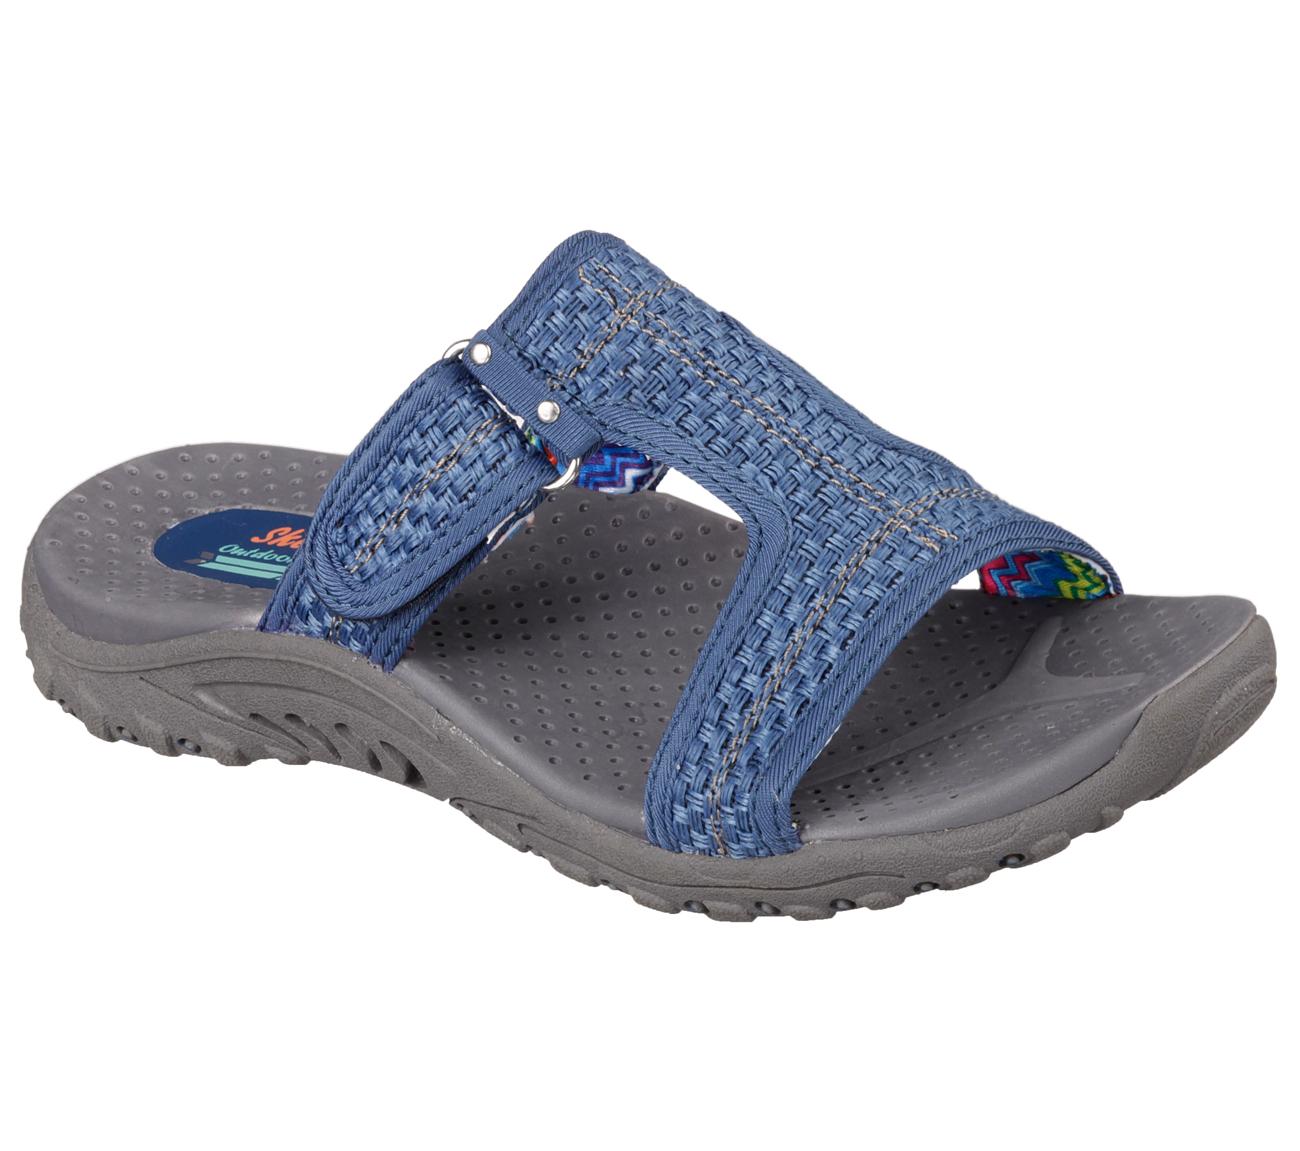 Buy Skechers Reggae Rockfestcomfort Sandals Shoes Only